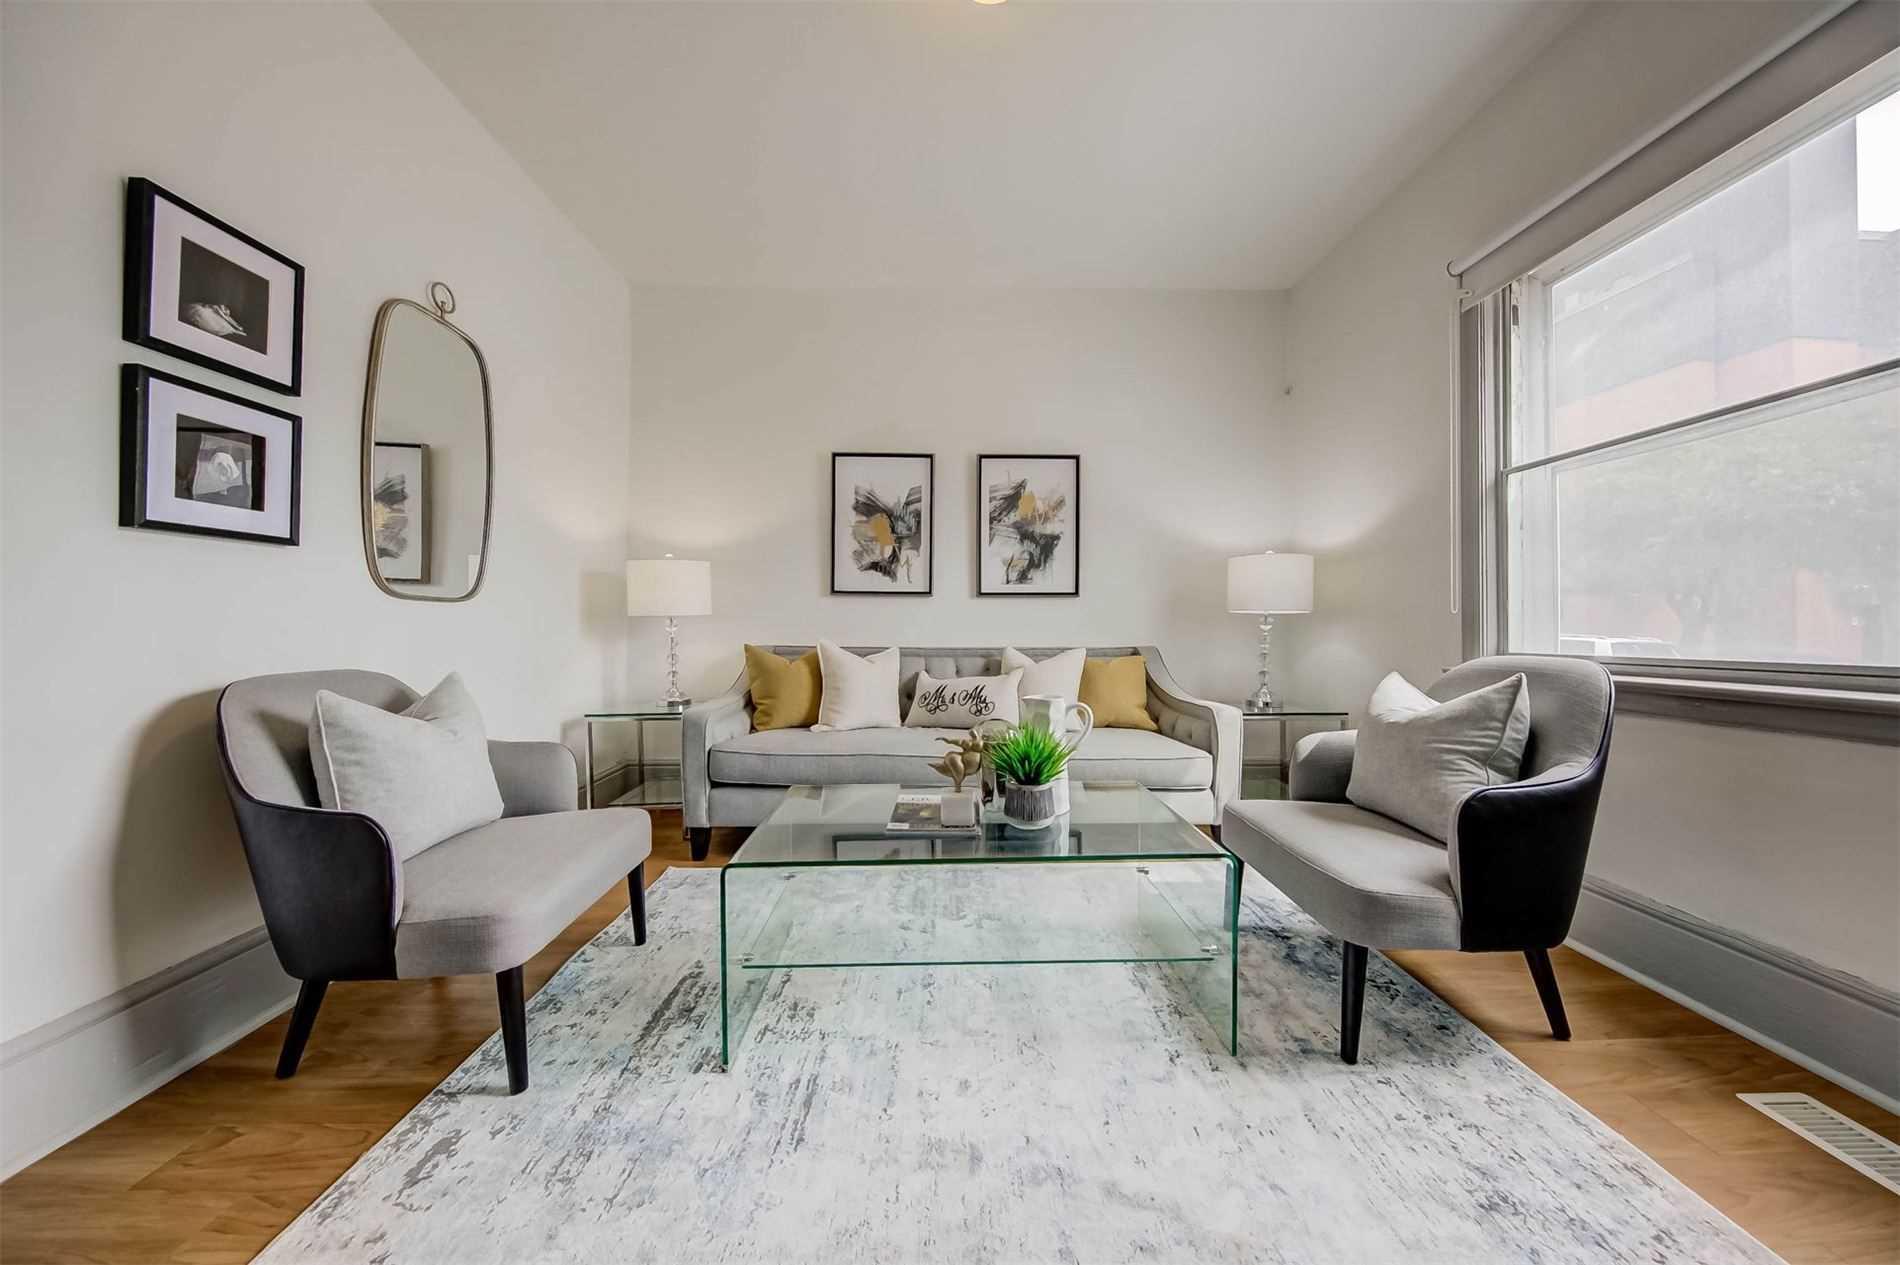 Semi-Detached For Sale In Toronto , 5 Bedrooms Bedrooms, ,2 BathroomsBathrooms,Semi-Detached,For Sale,Ryerson